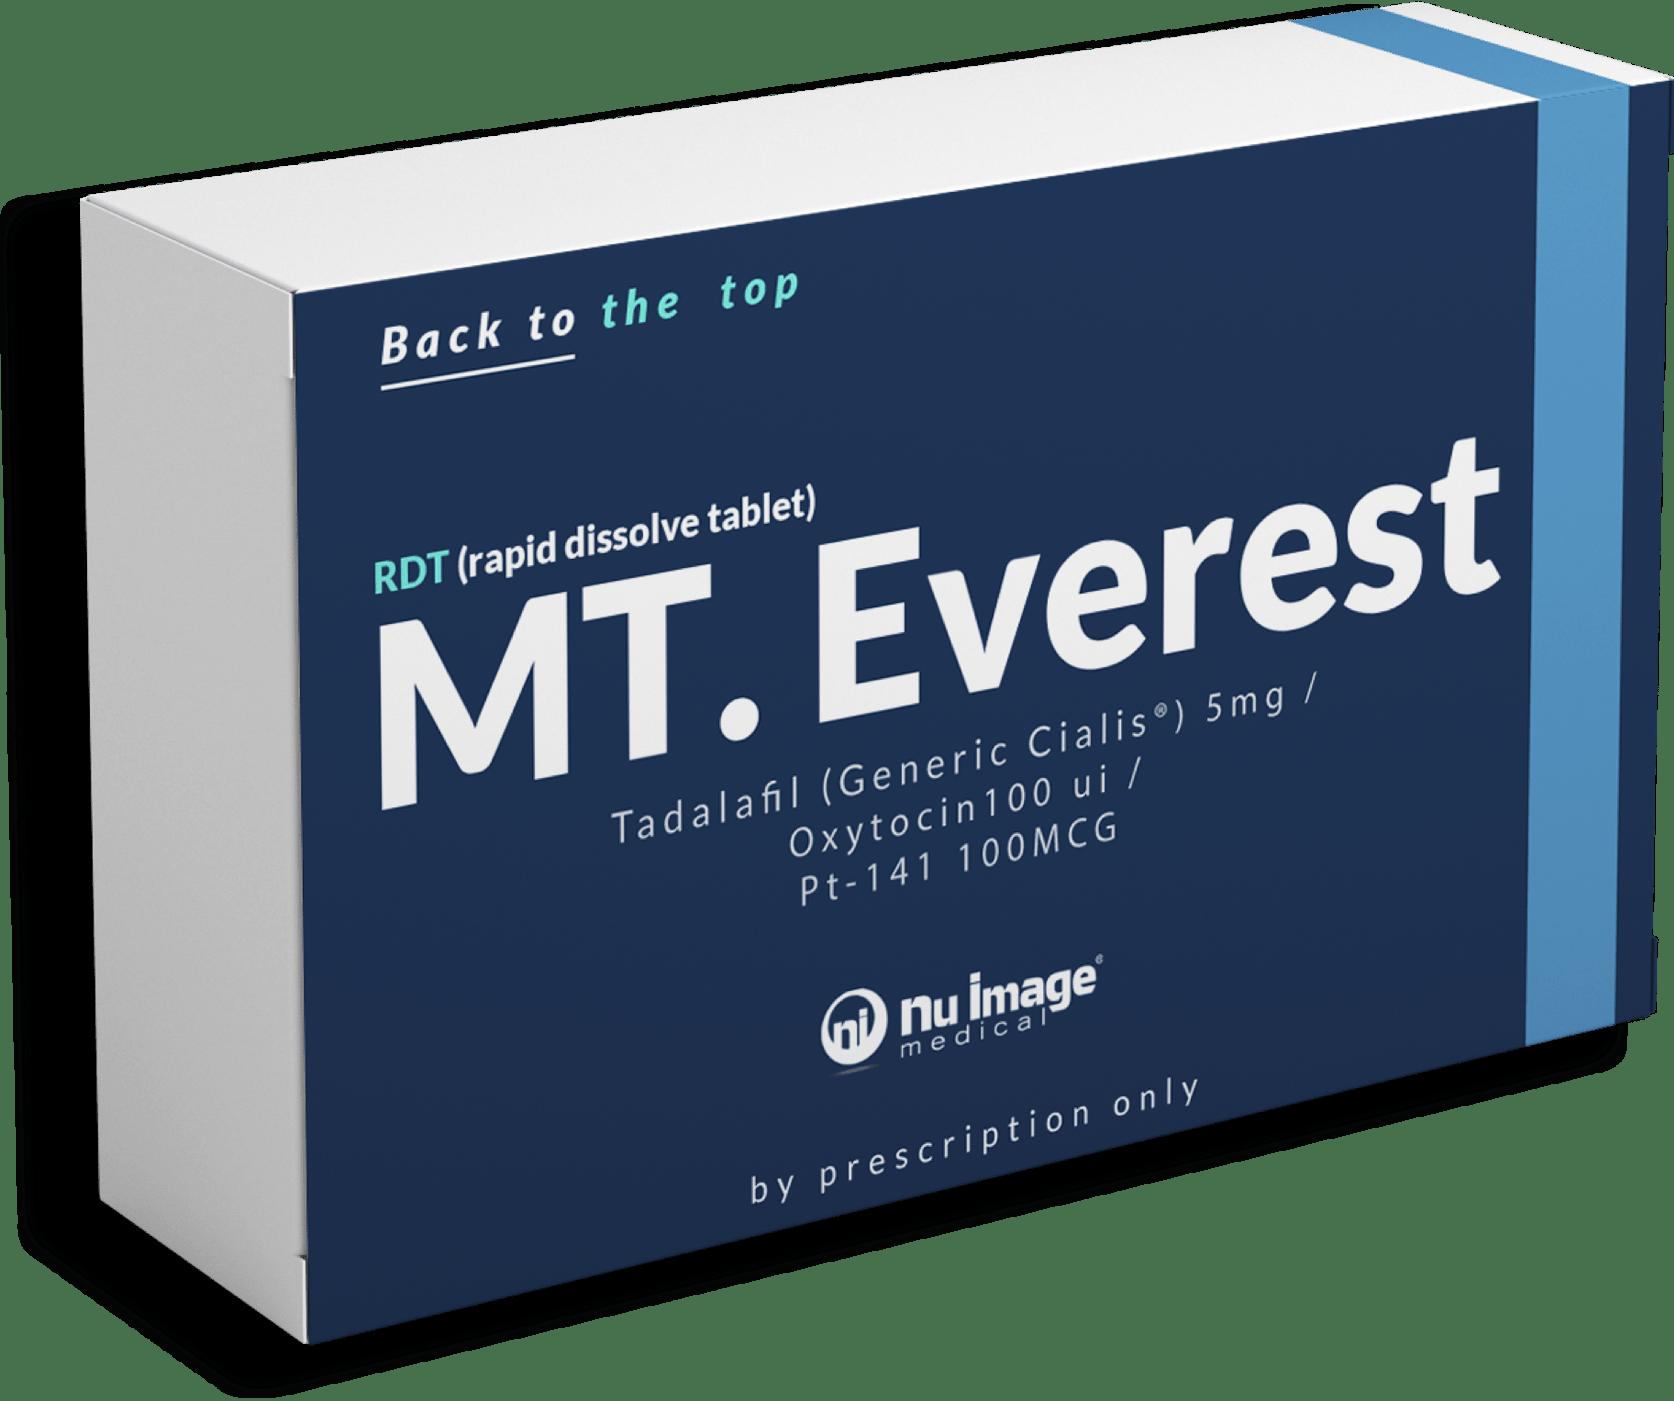 Mt. Everest – ED treatment for men – hm11